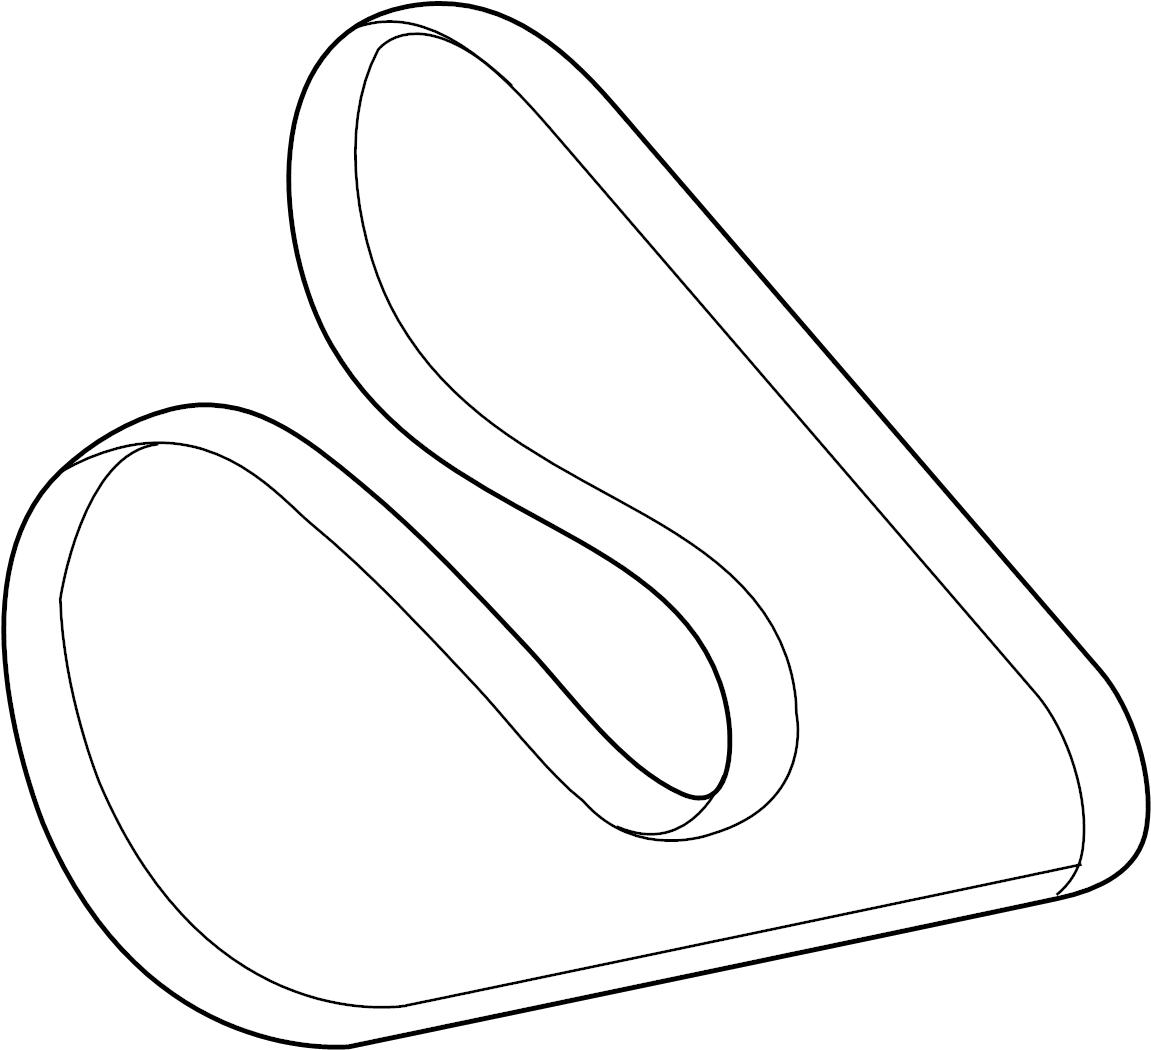 tags: #ford serpentine belt diagram#serpentine belt routing on 97 f150#ford  f 150 serpentine belt routing diagram#2006 ford f 150 serpentine belt